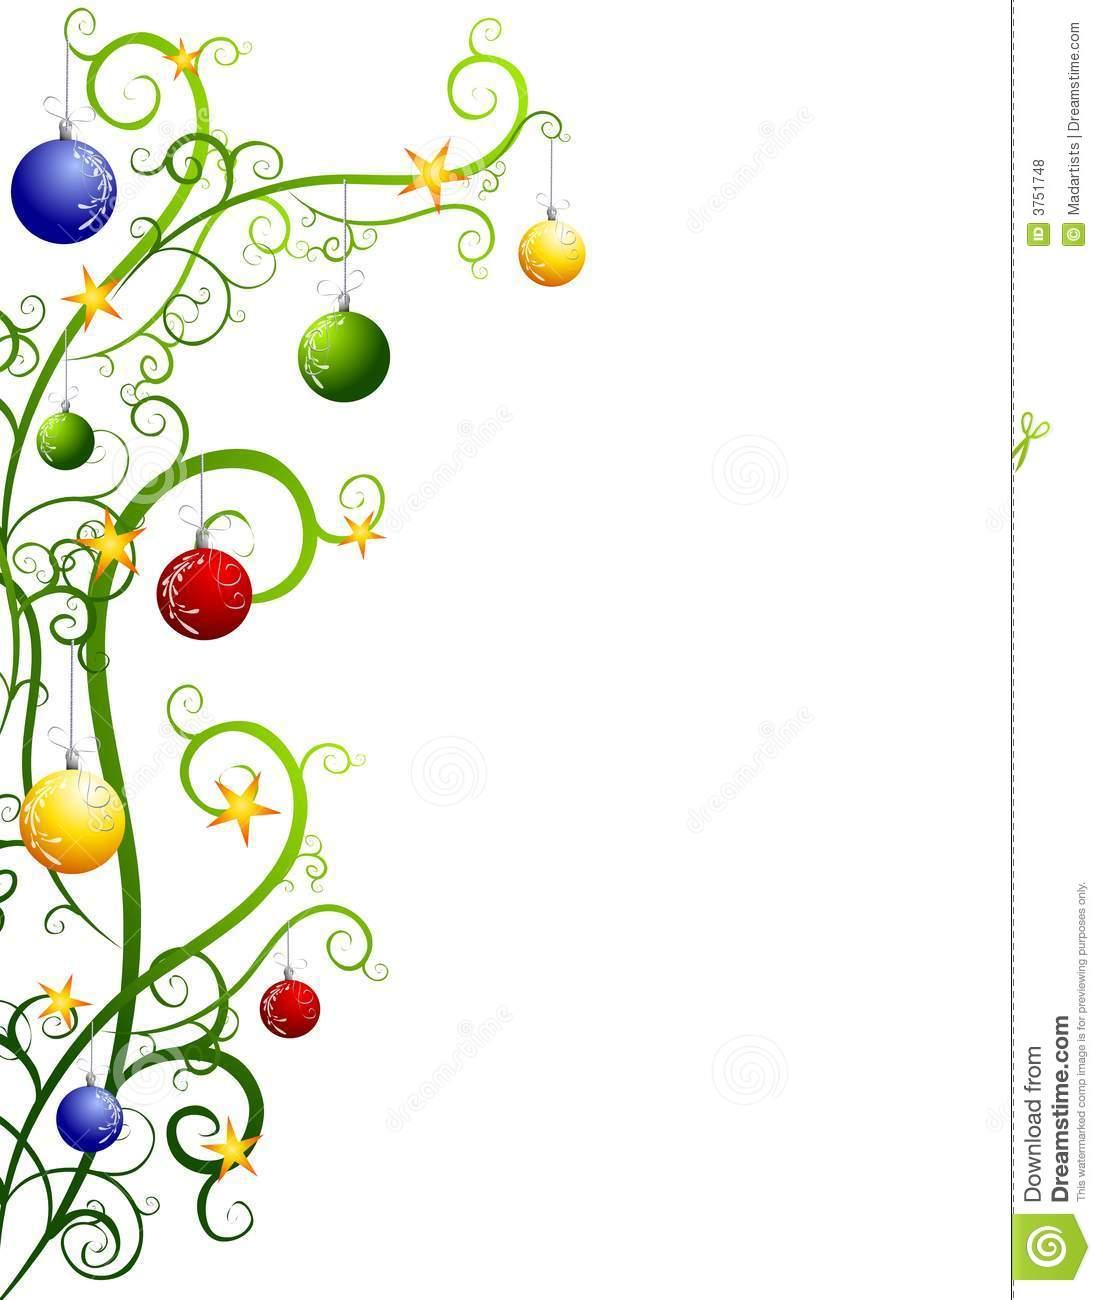 1101x1300 Christmas Tree Border Clip Art Fun For Christmas